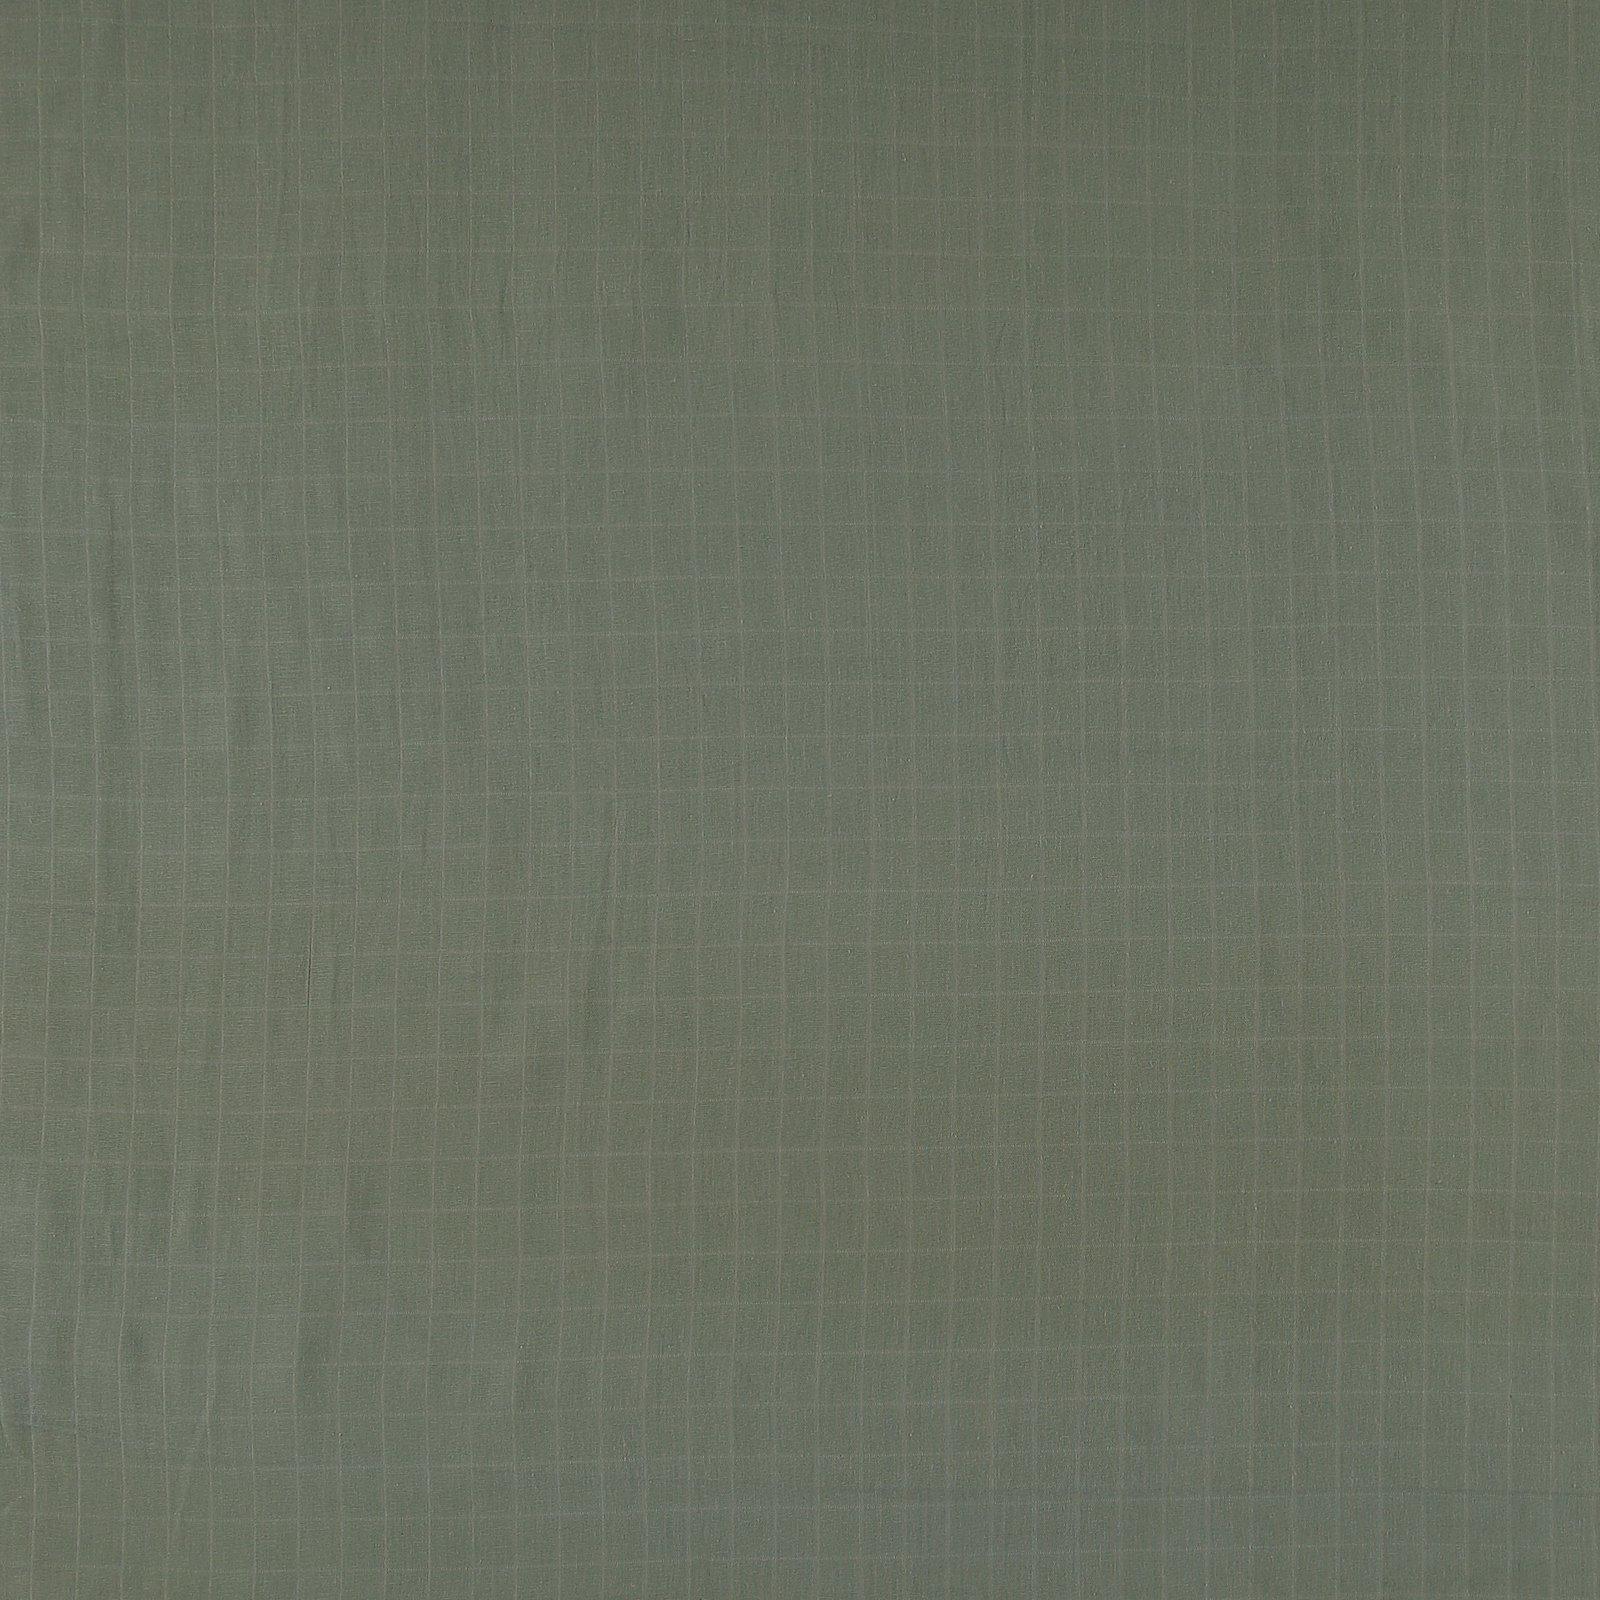 Muslin light dusty green 501708_pack_solid